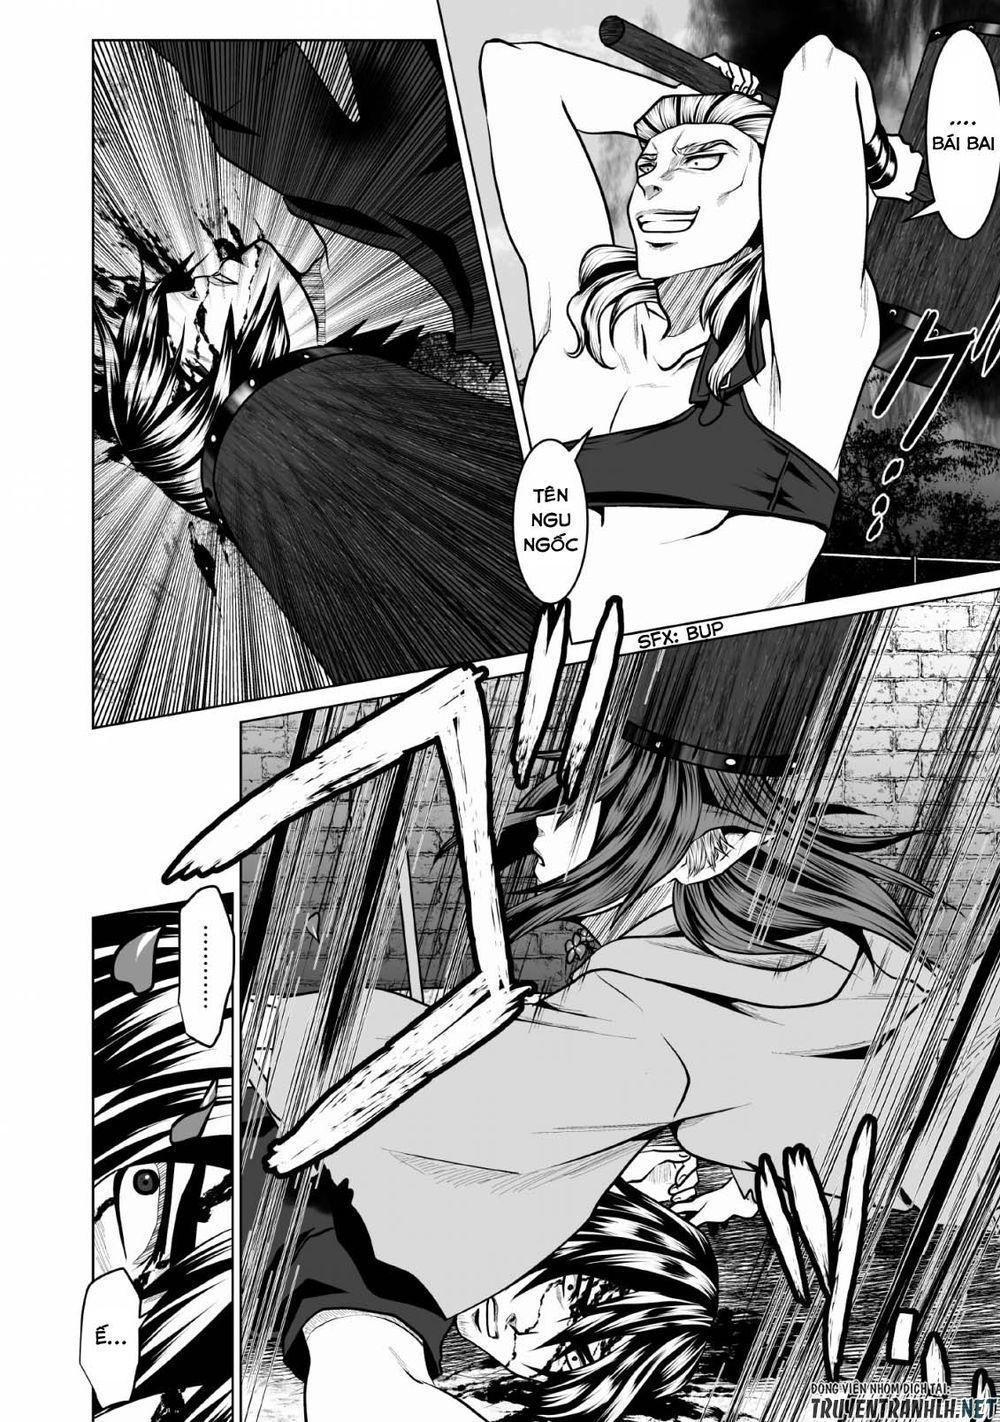 DHM - Dungeon + Harem + Master (Manga): Chapter 3